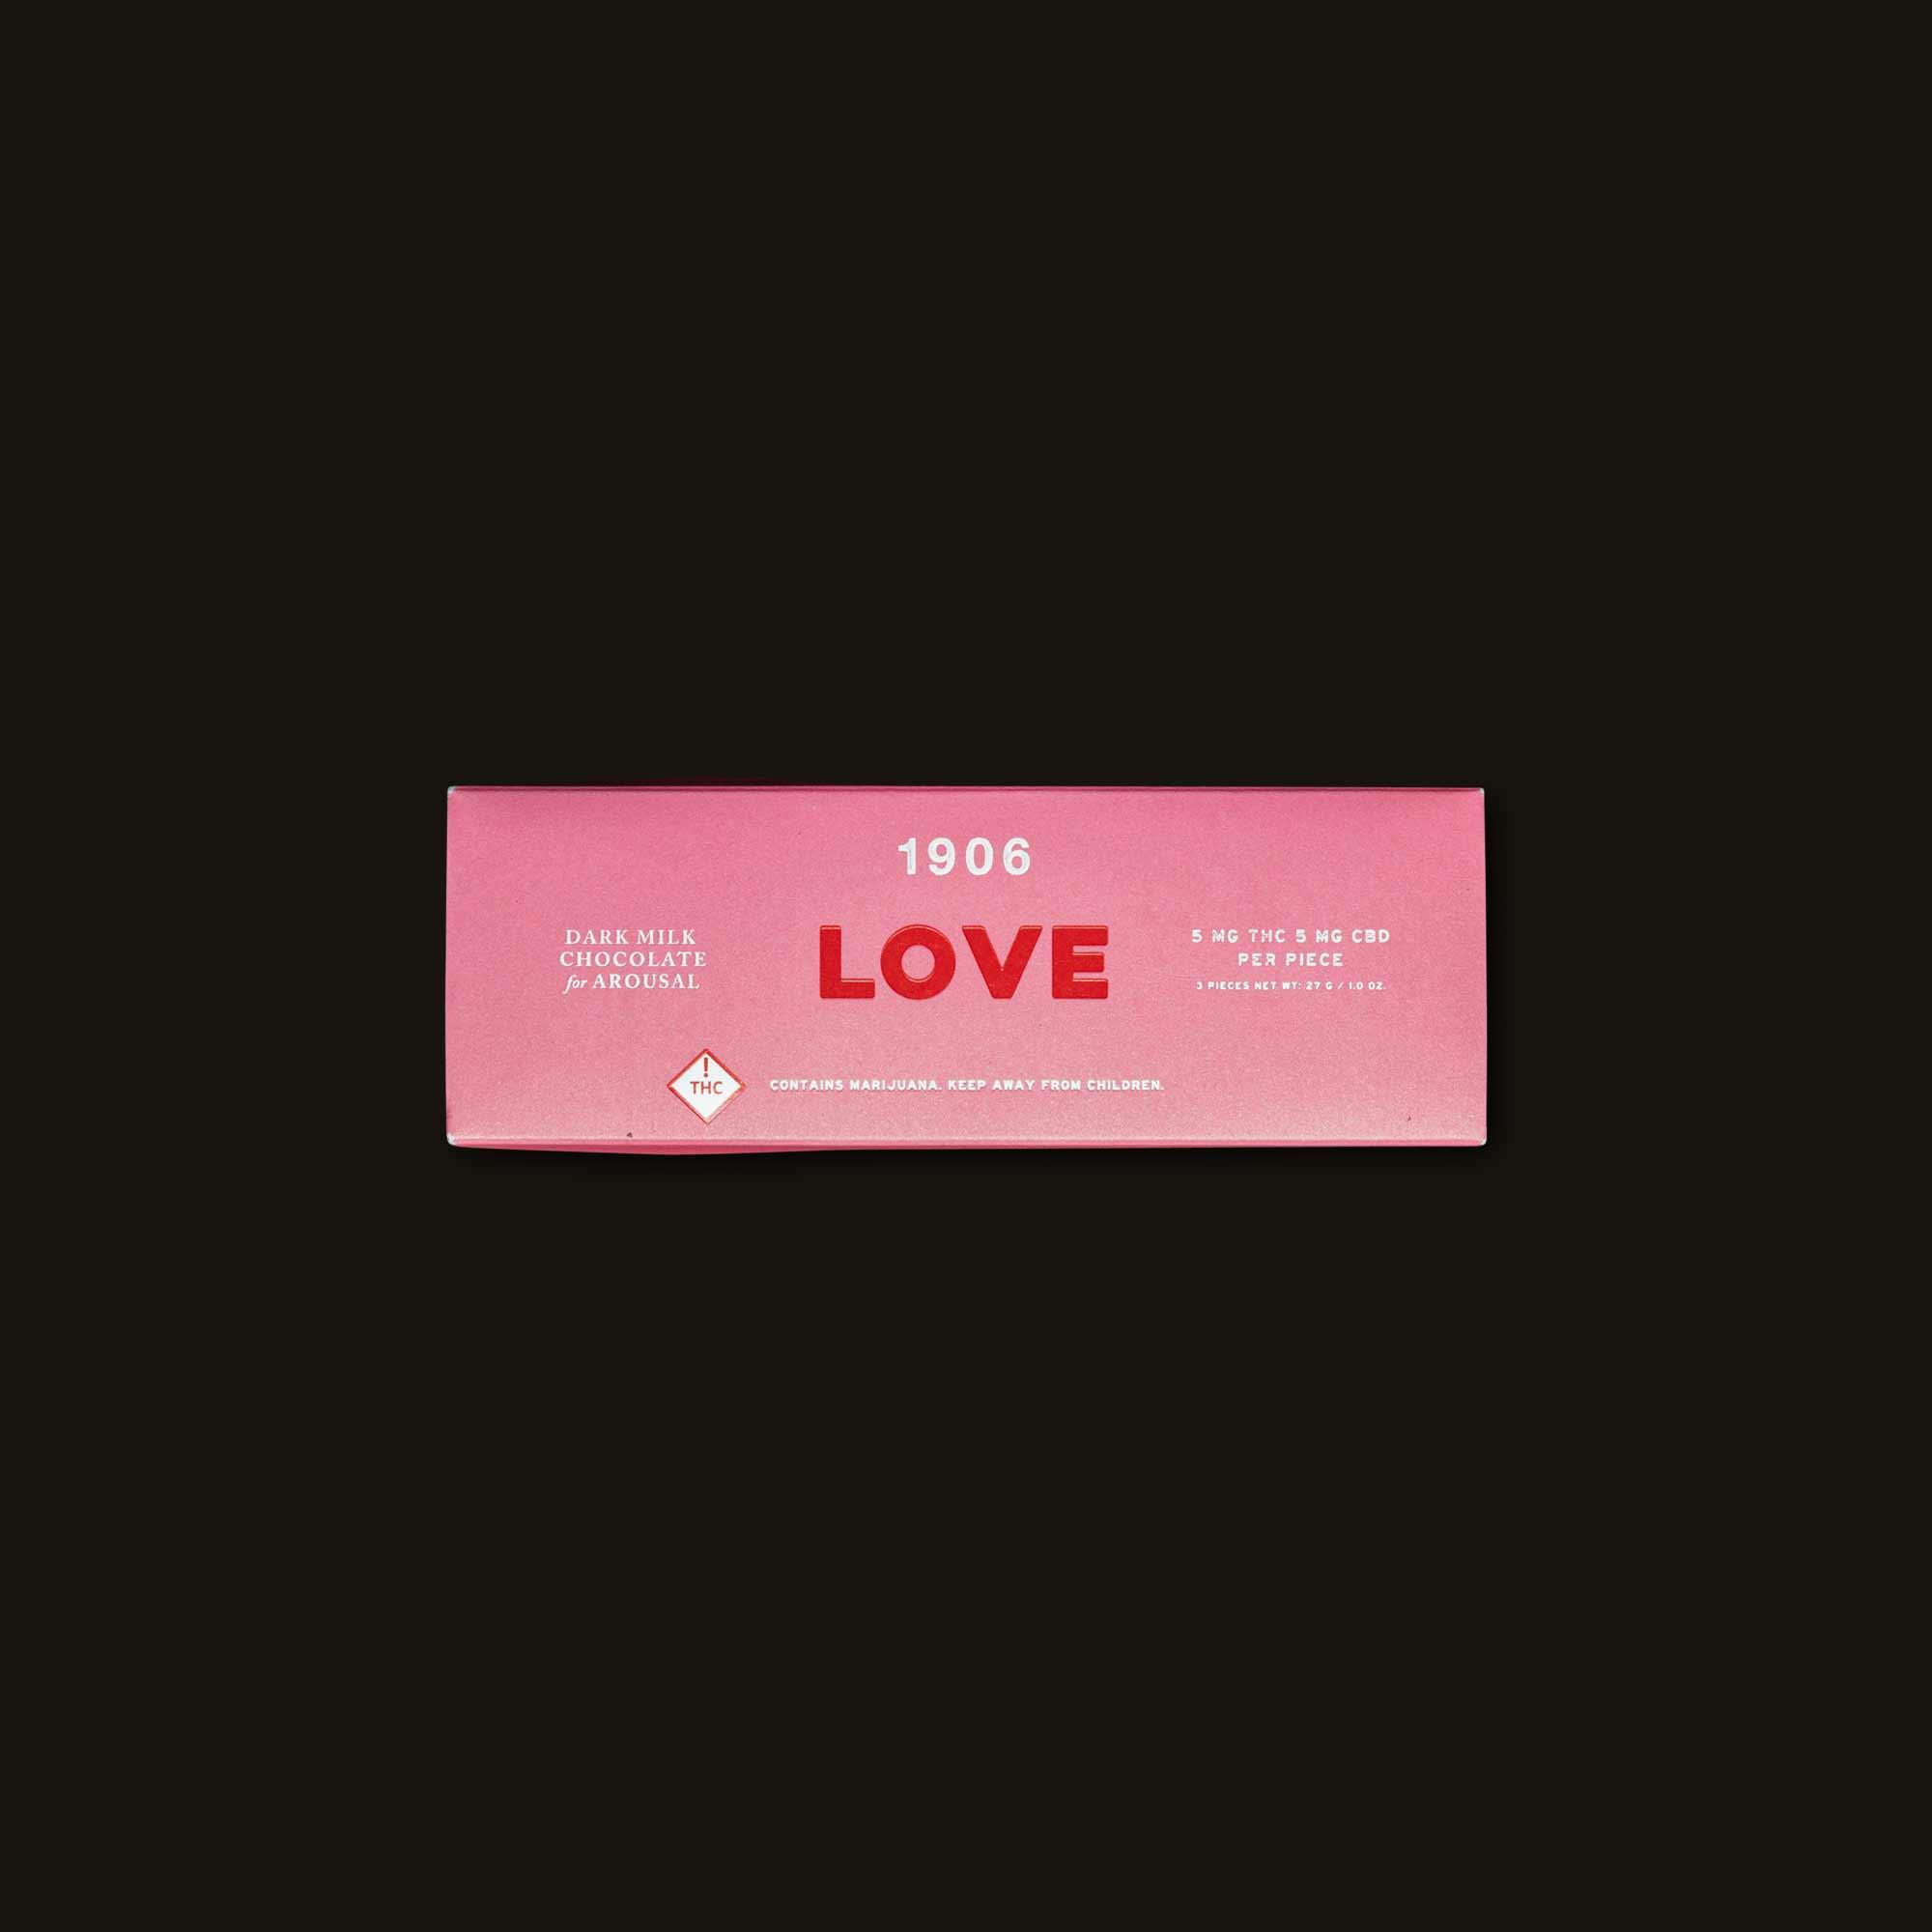 Love - 3 chocolates (15mg THC, 15mg CBD)